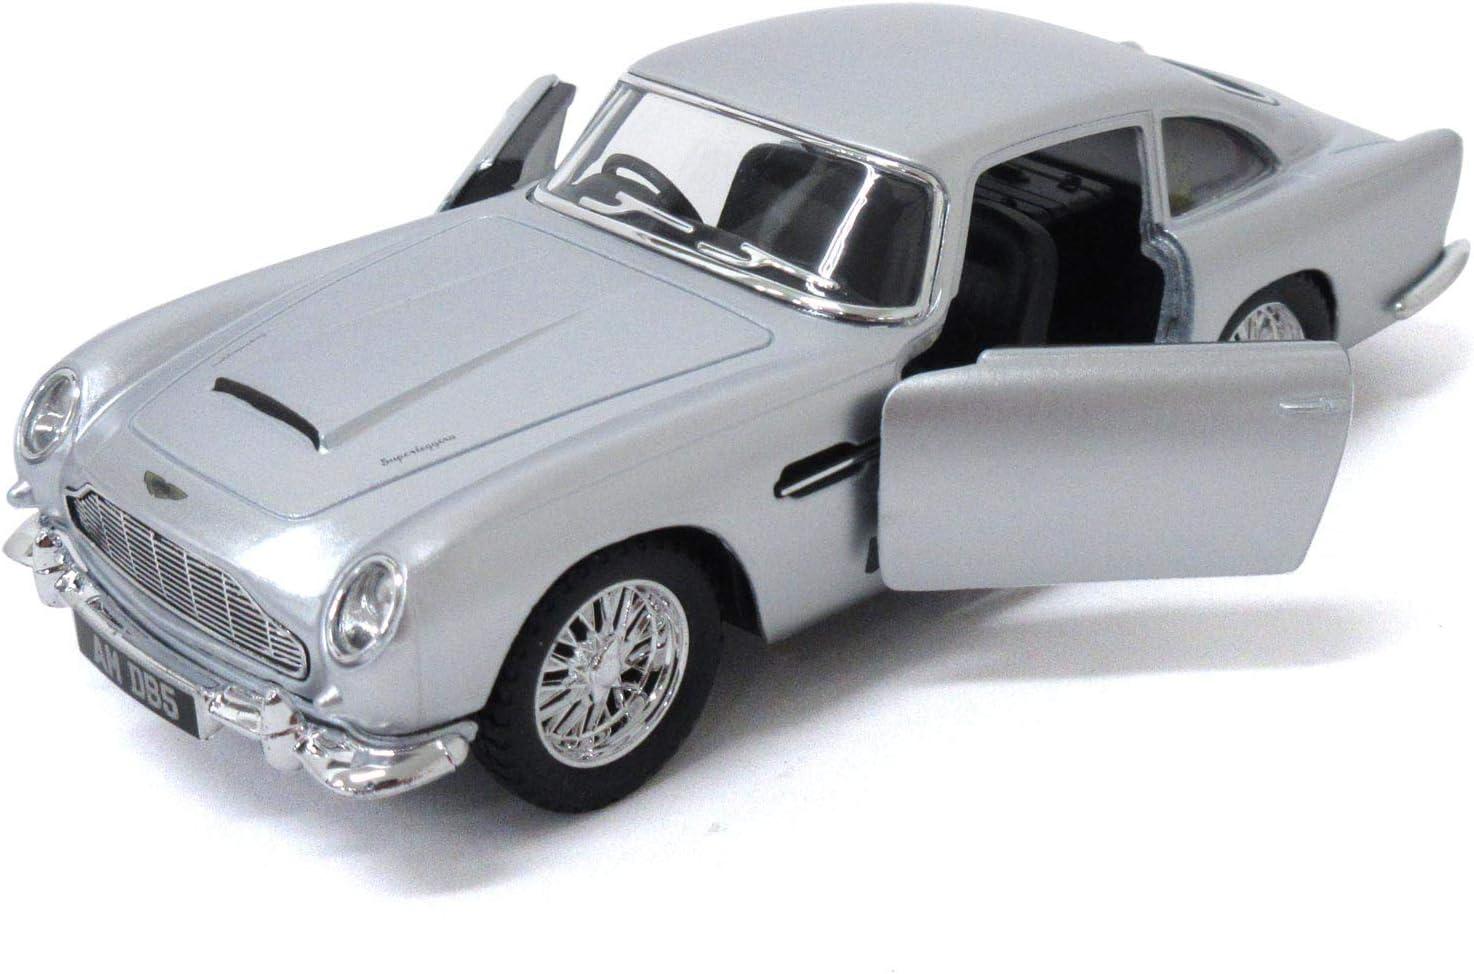 Kinsmart Aston Martin Db5 Modellauto Maßstab 1 38 Metalldruckguss öffnungstüren Detailliert Amazon De Spielzeug